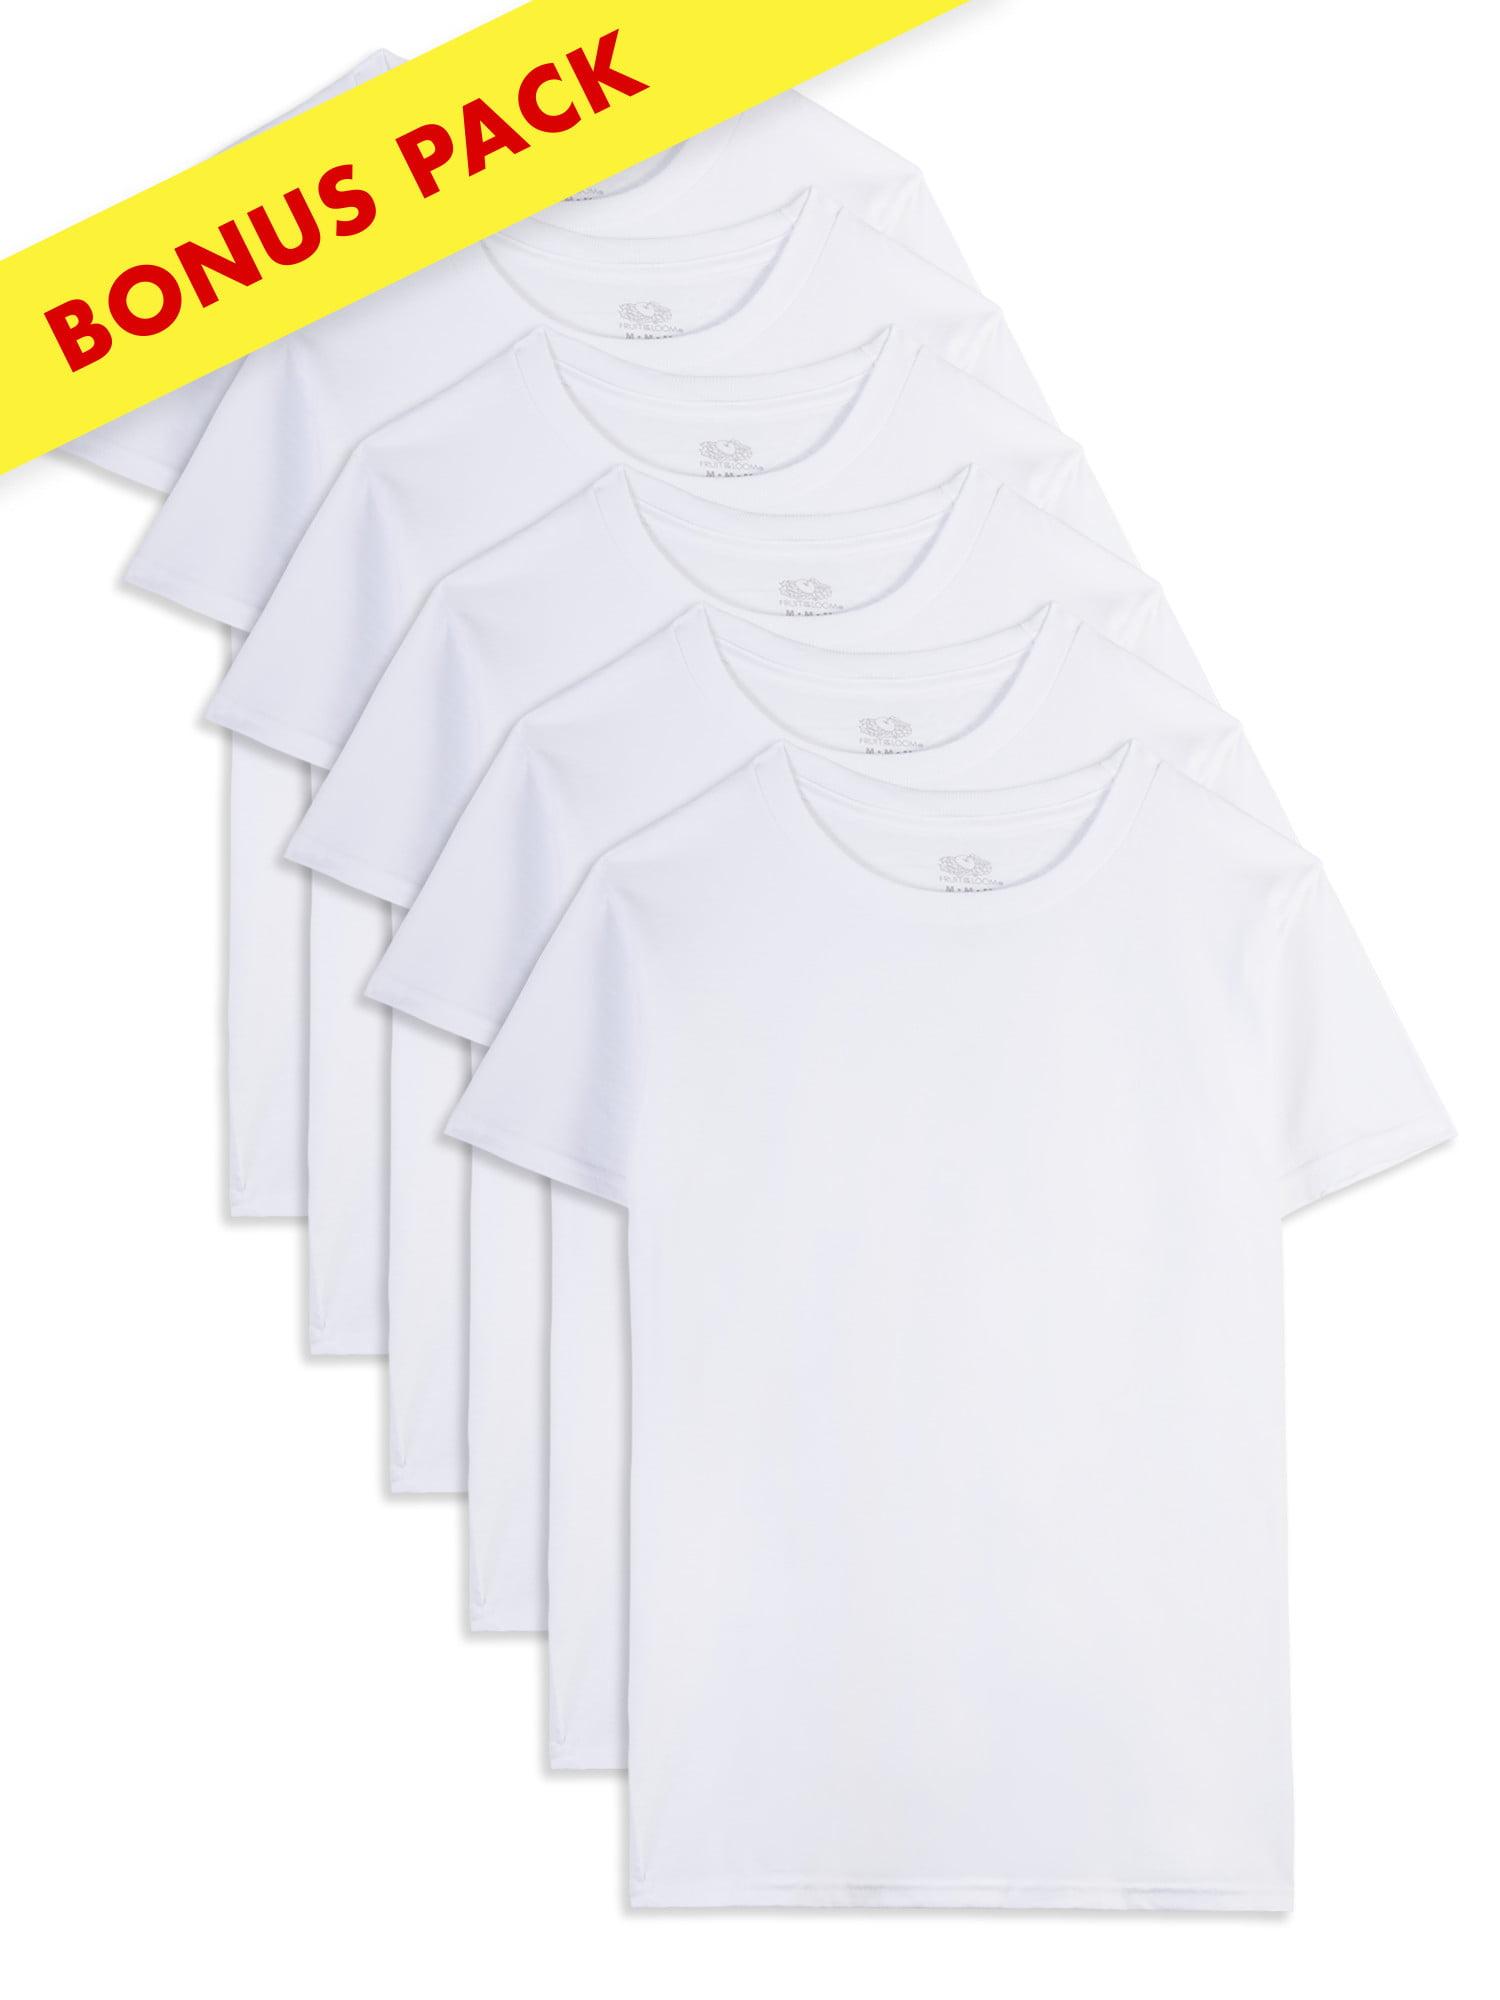 Fruit of the Loom White Crew T-Shirts, 5+1 Holiday Bonus Pack (Toddler Boy)